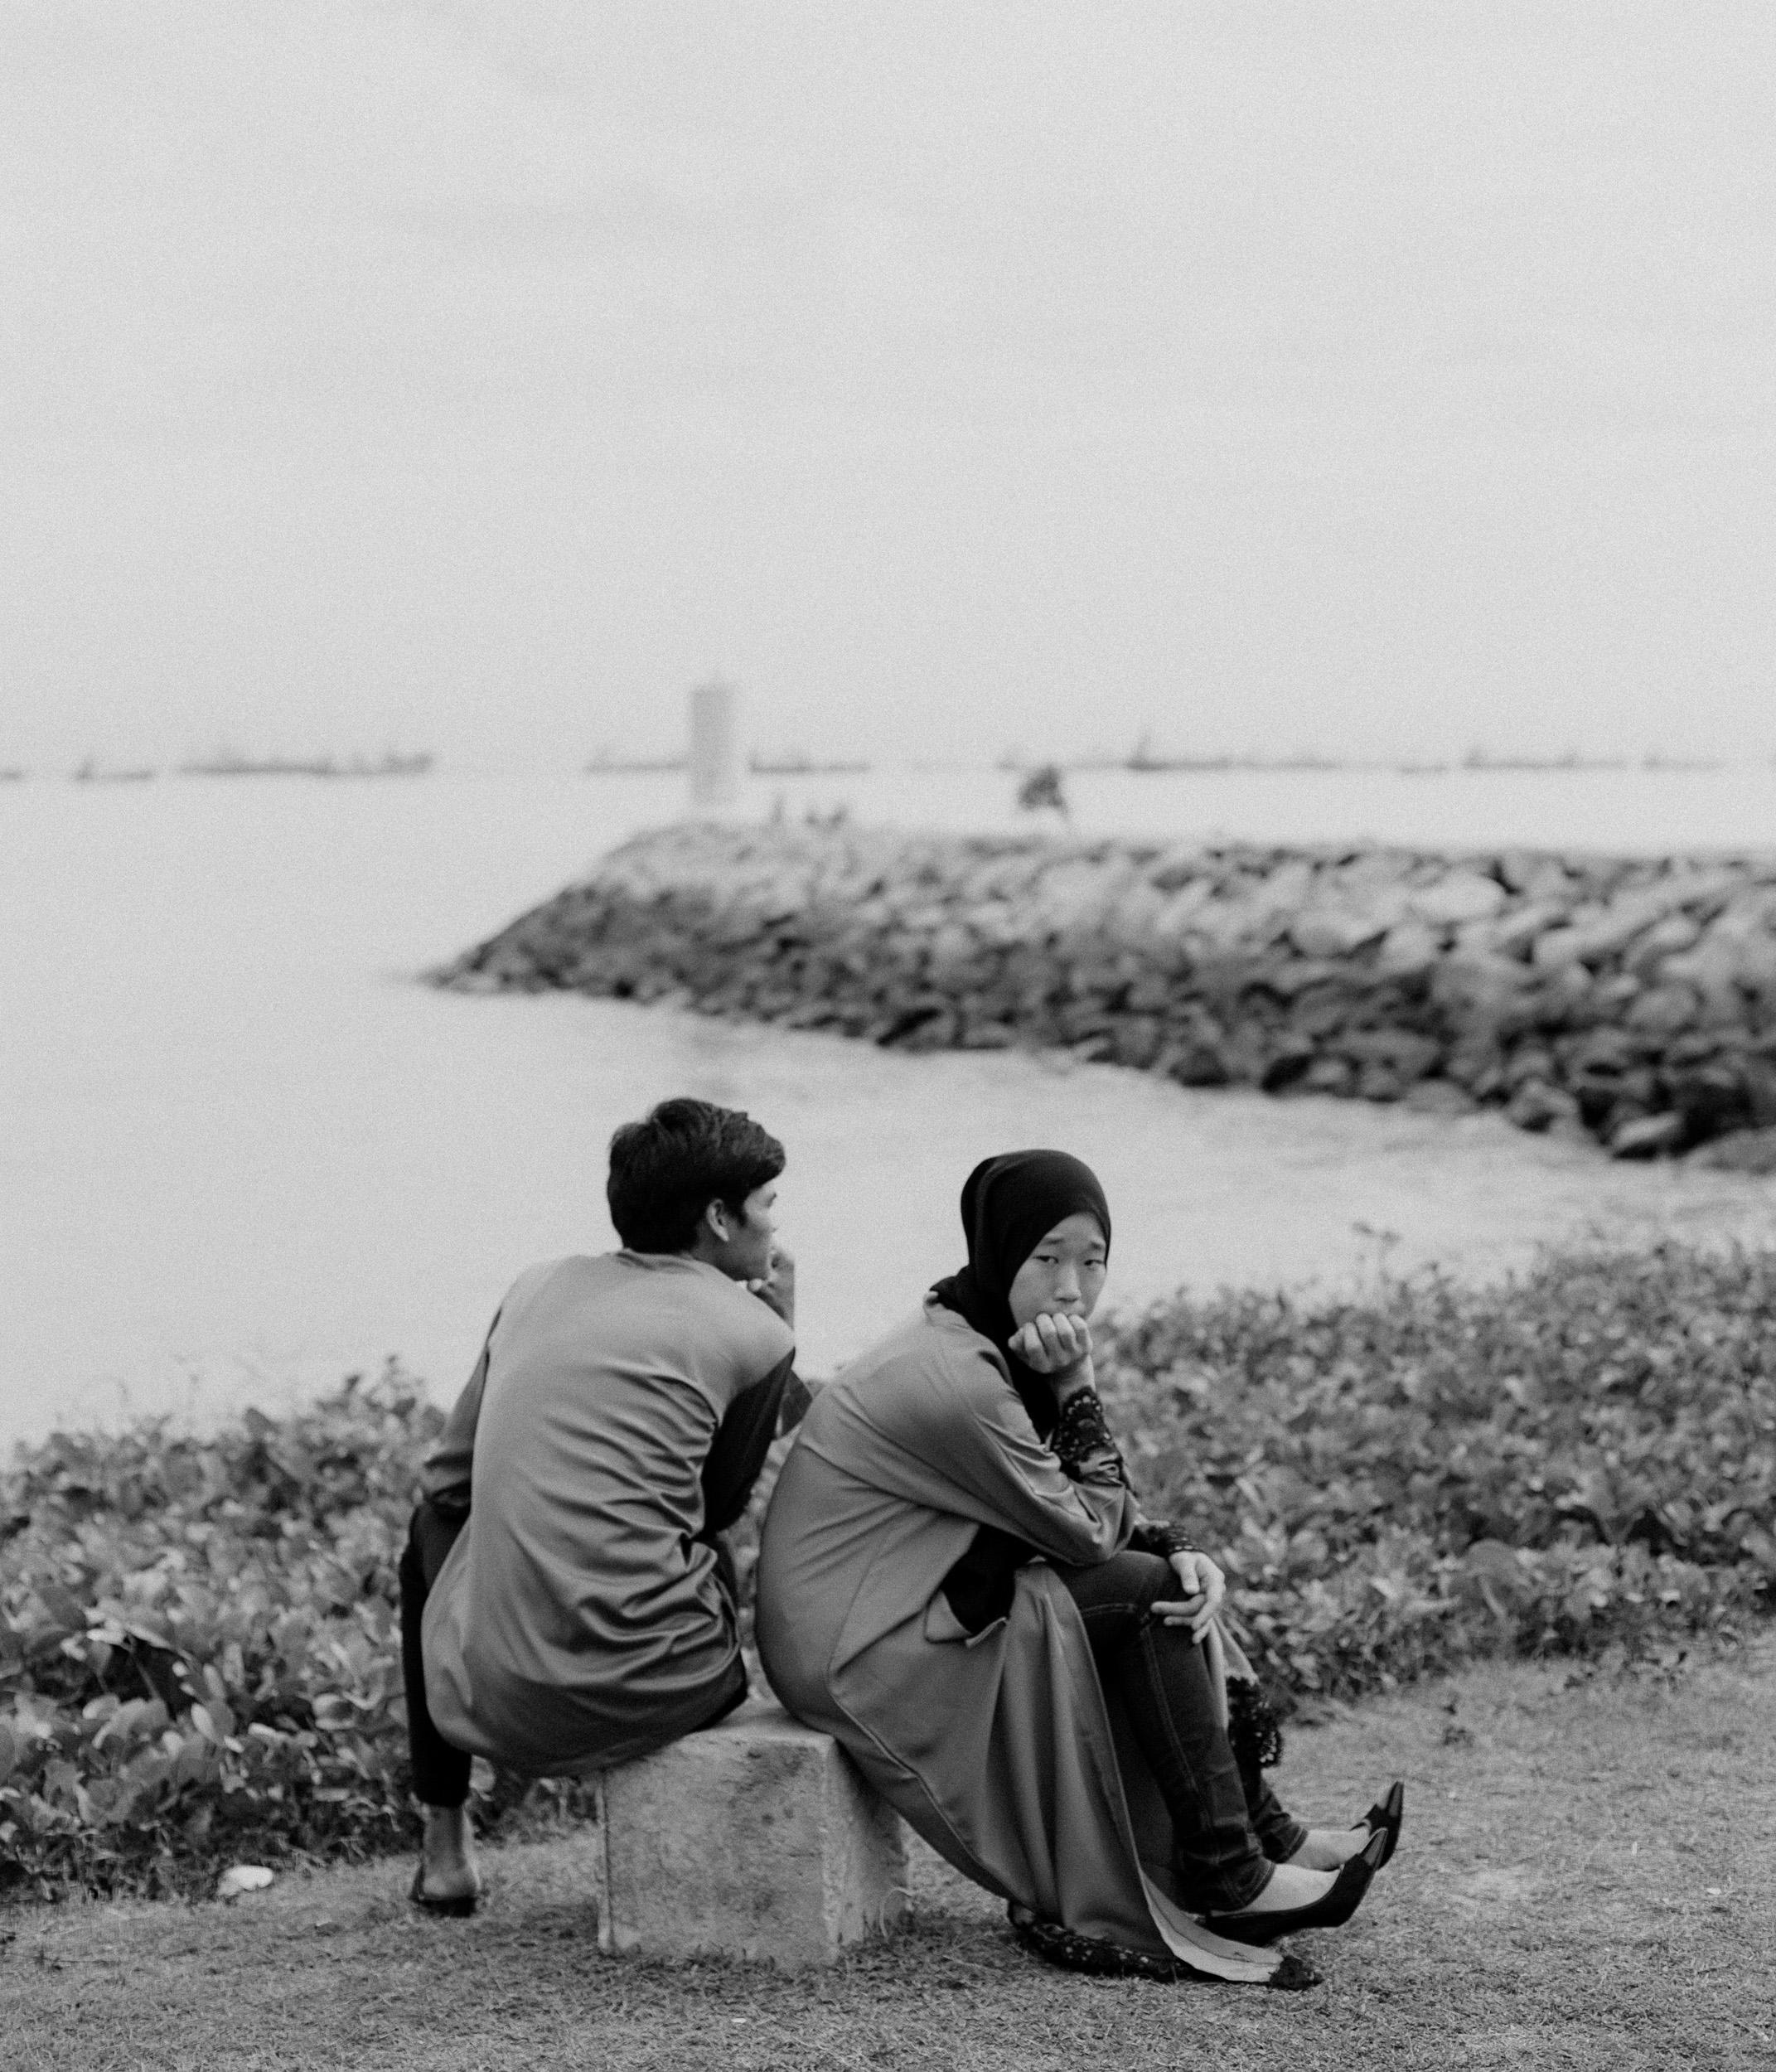 singapore-wedding-photographer-photography-wmt2017-153.jpg